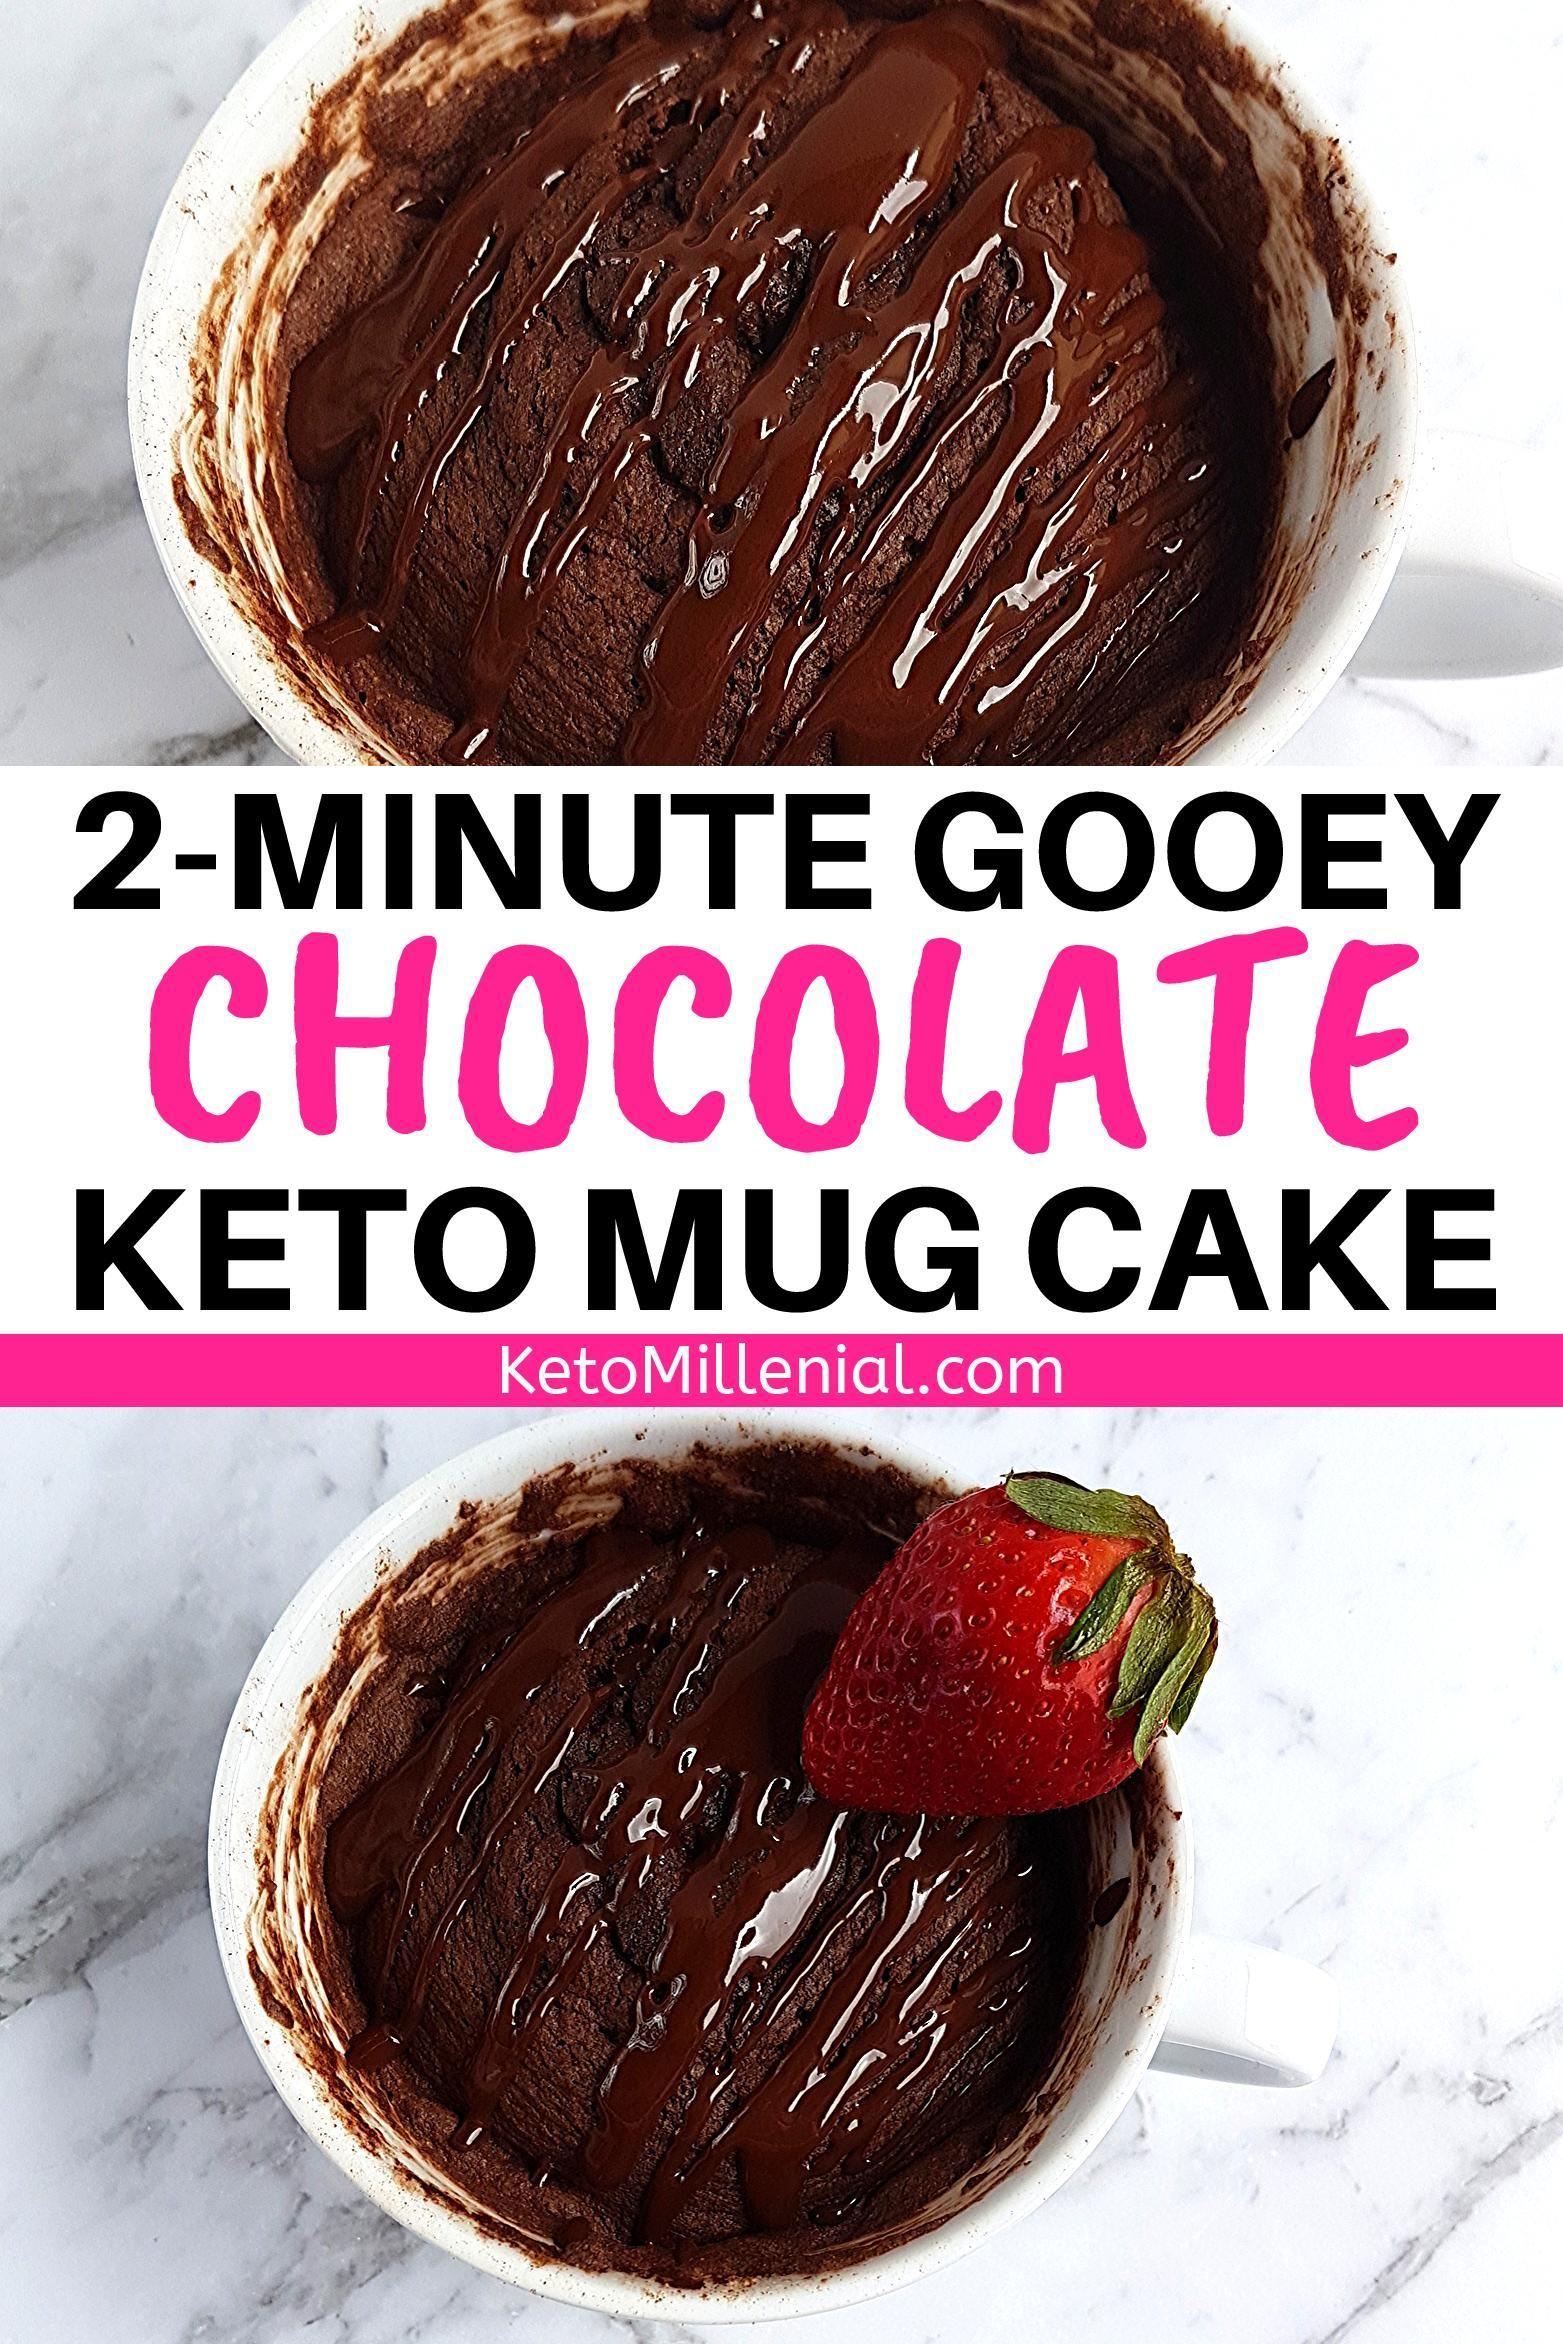 Easy Keto Chocolate Mug Cake Recipe Ready In 2 Minutes # ...